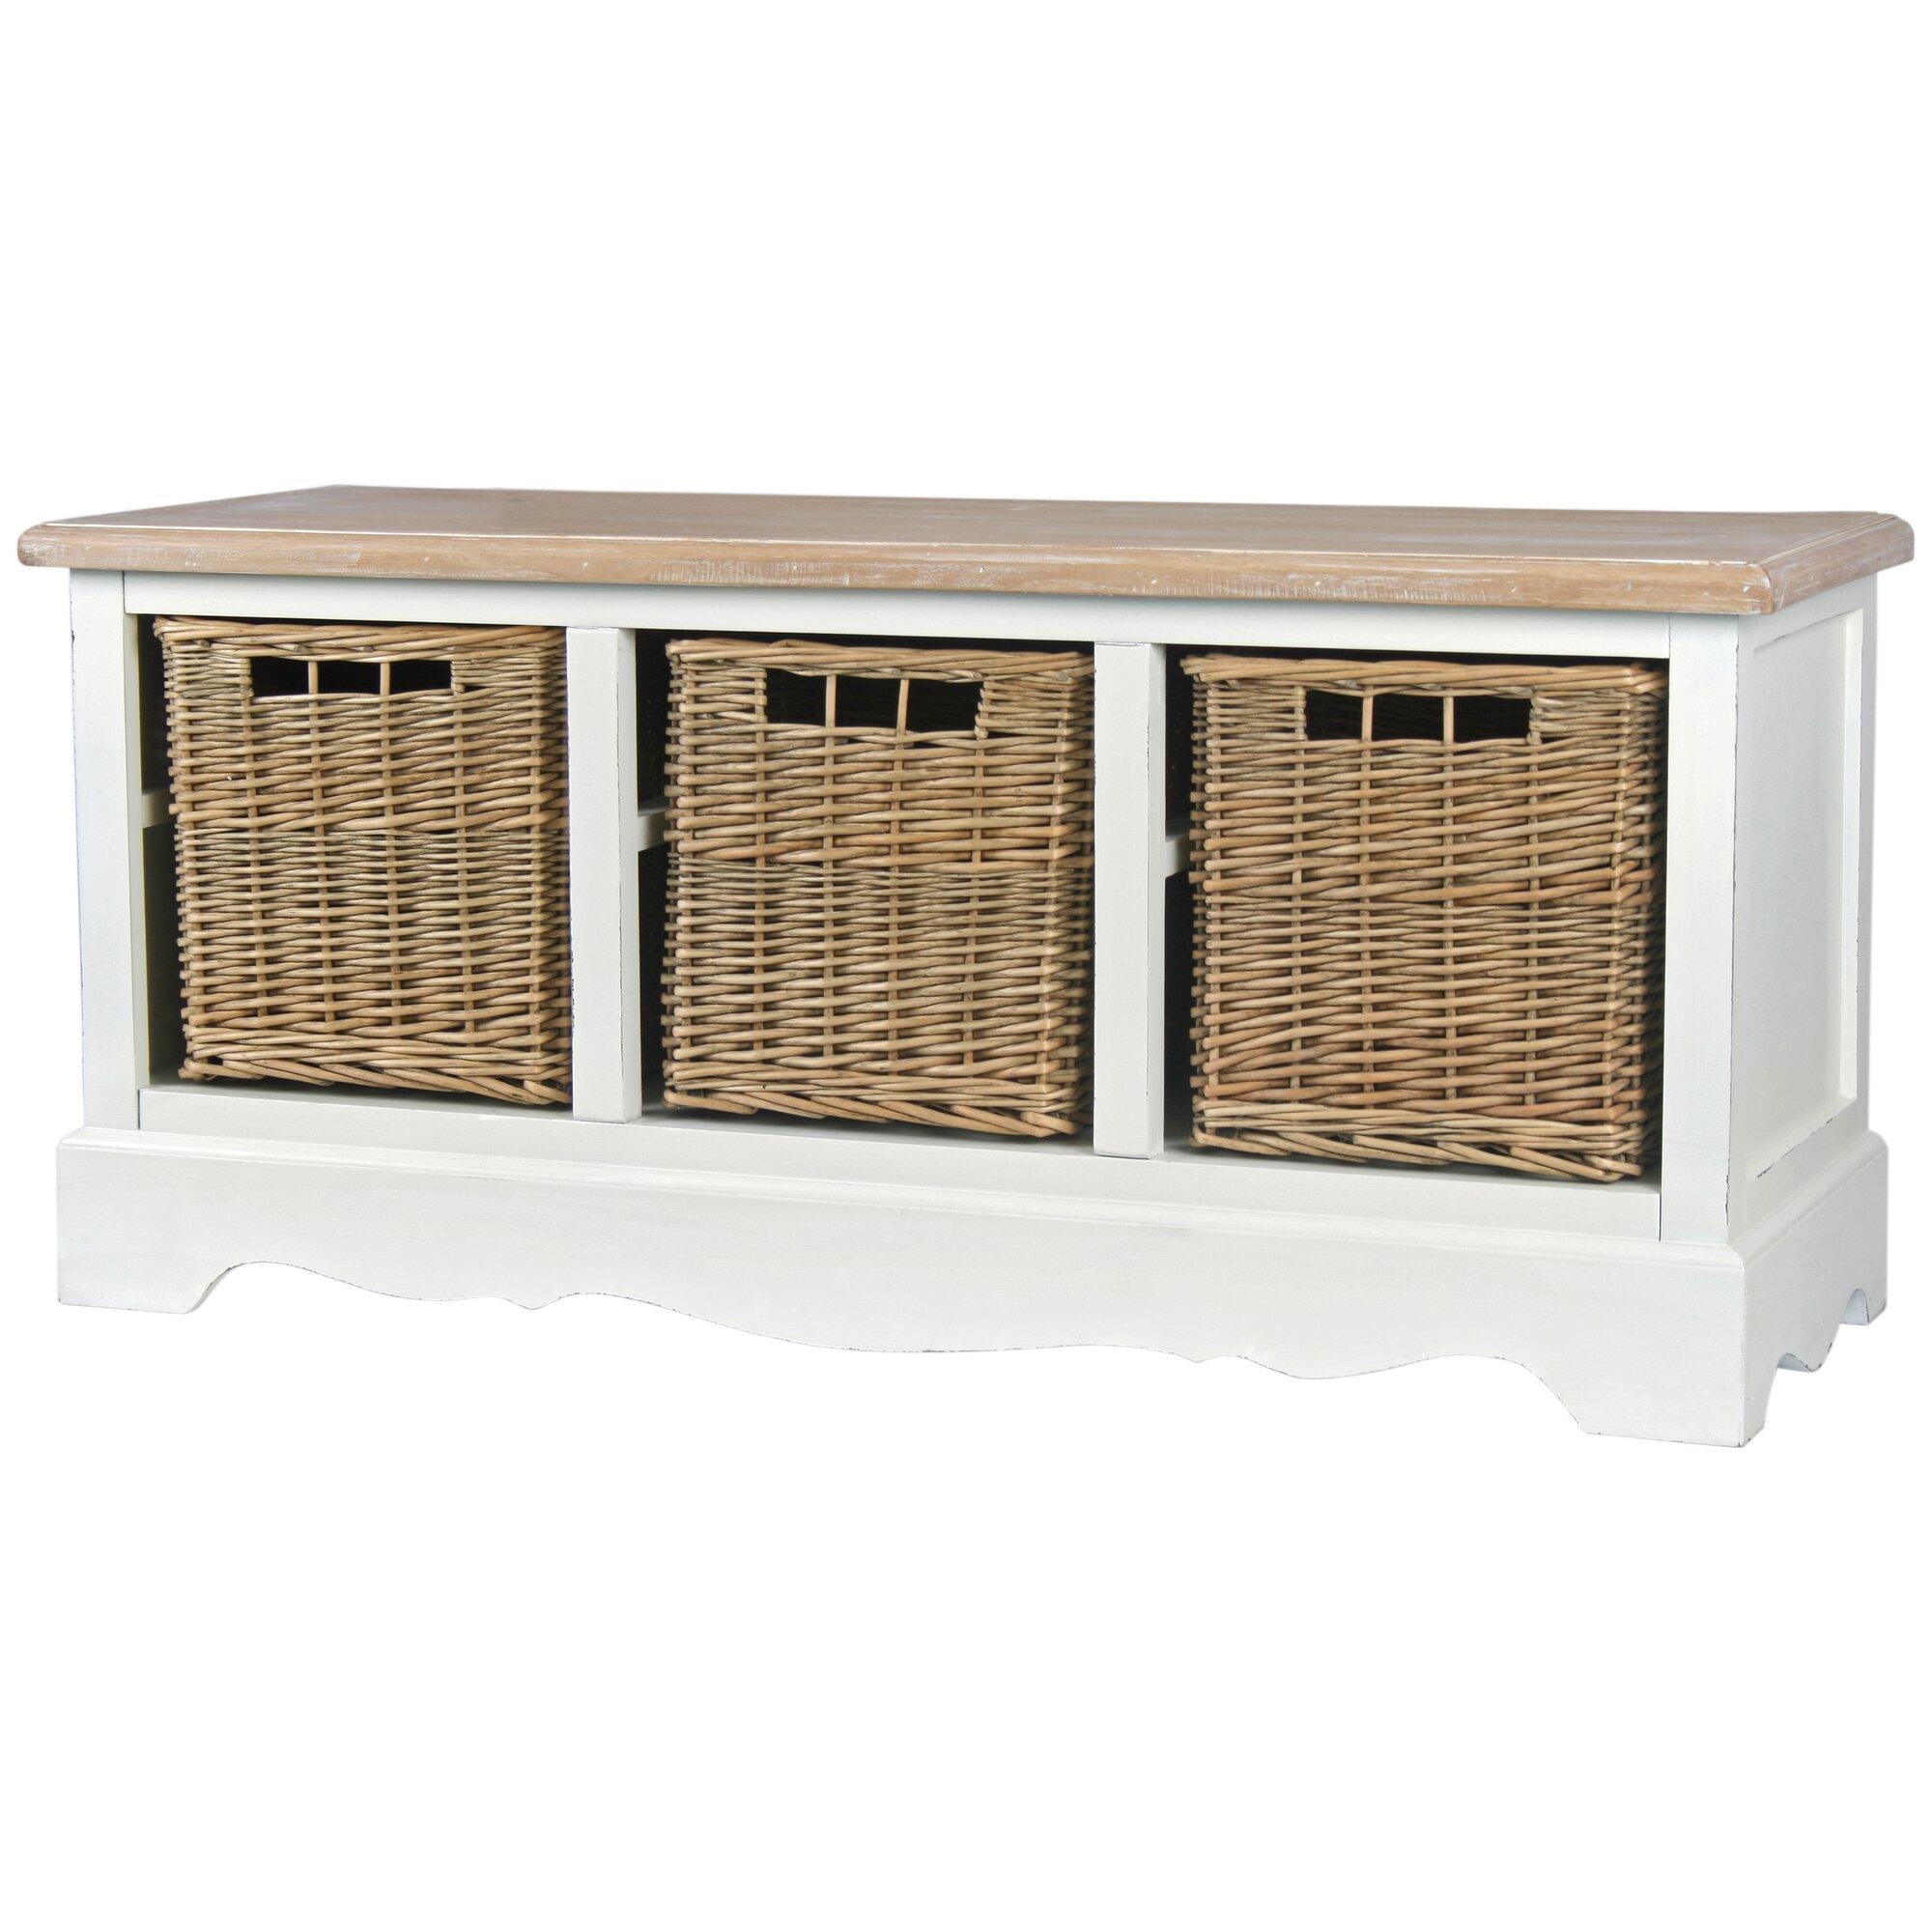 maison alouette sitzbank ripley aus holz mit stauraum bewertungen. Black Bedroom Furniture Sets. Home Design Ideas